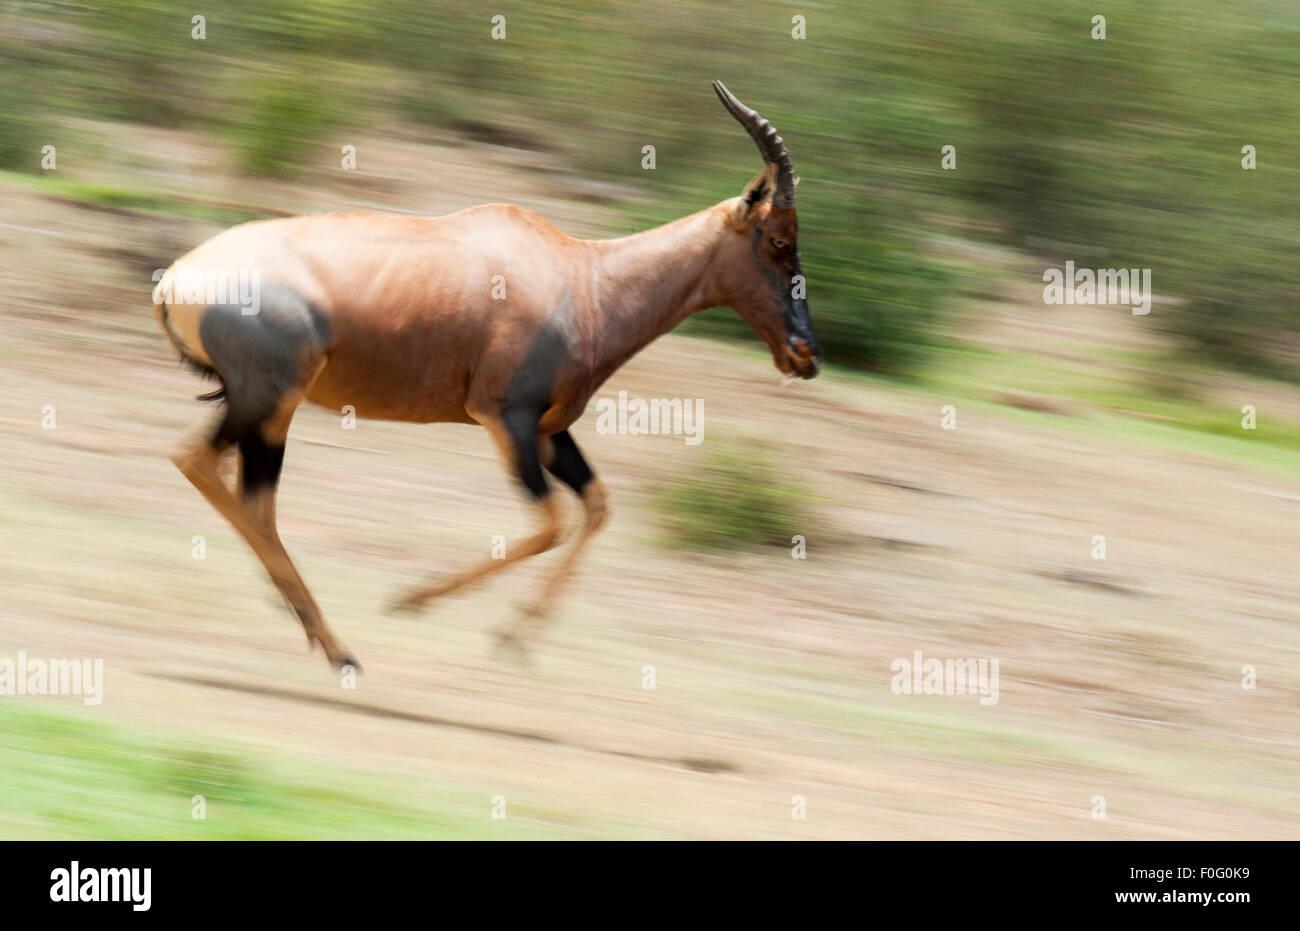 Topi running at full speed Mara Naboisho conservancy Kenya Africa - Stock Image